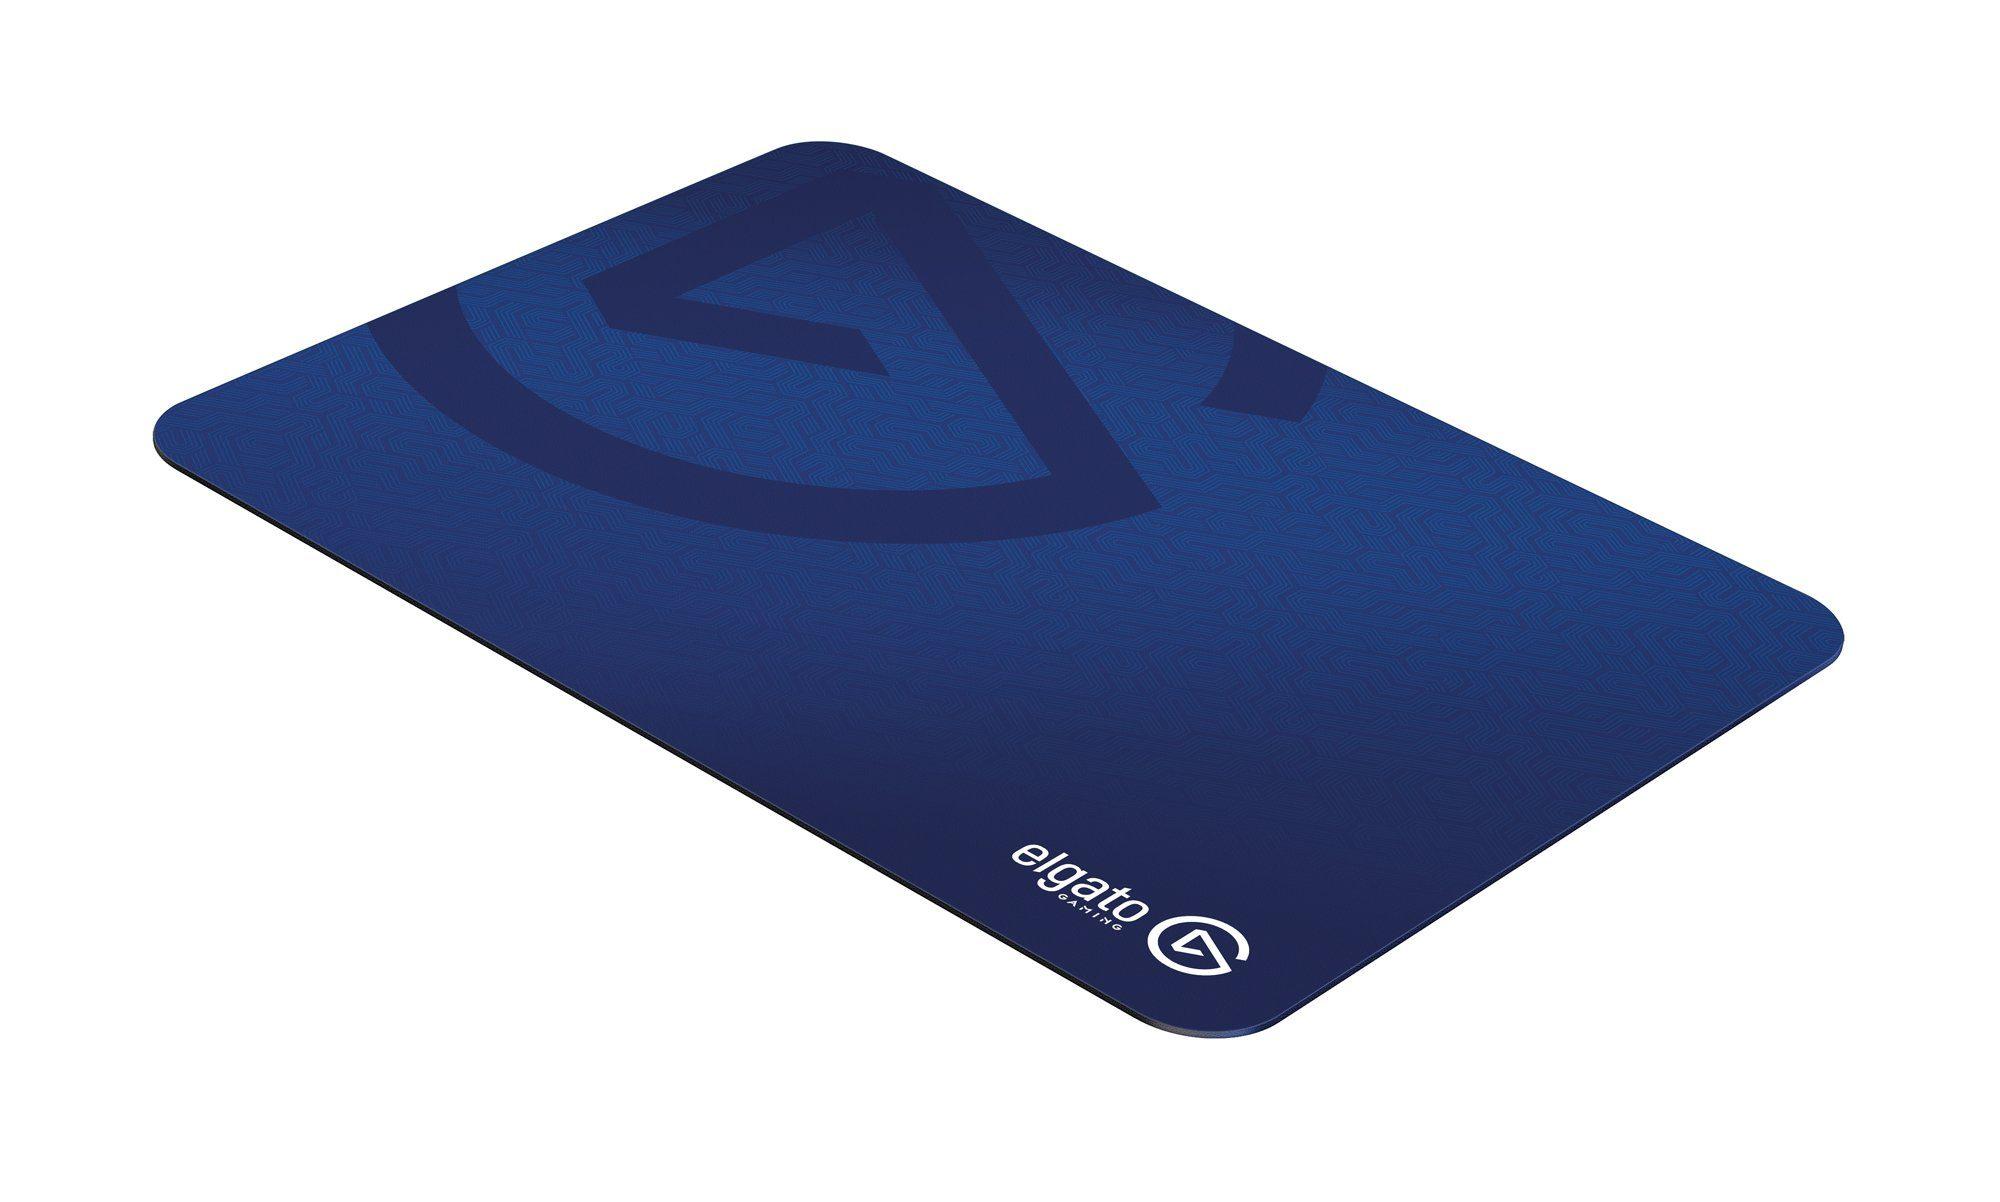 Elgato Gaming »Elgato Mouse Mat«